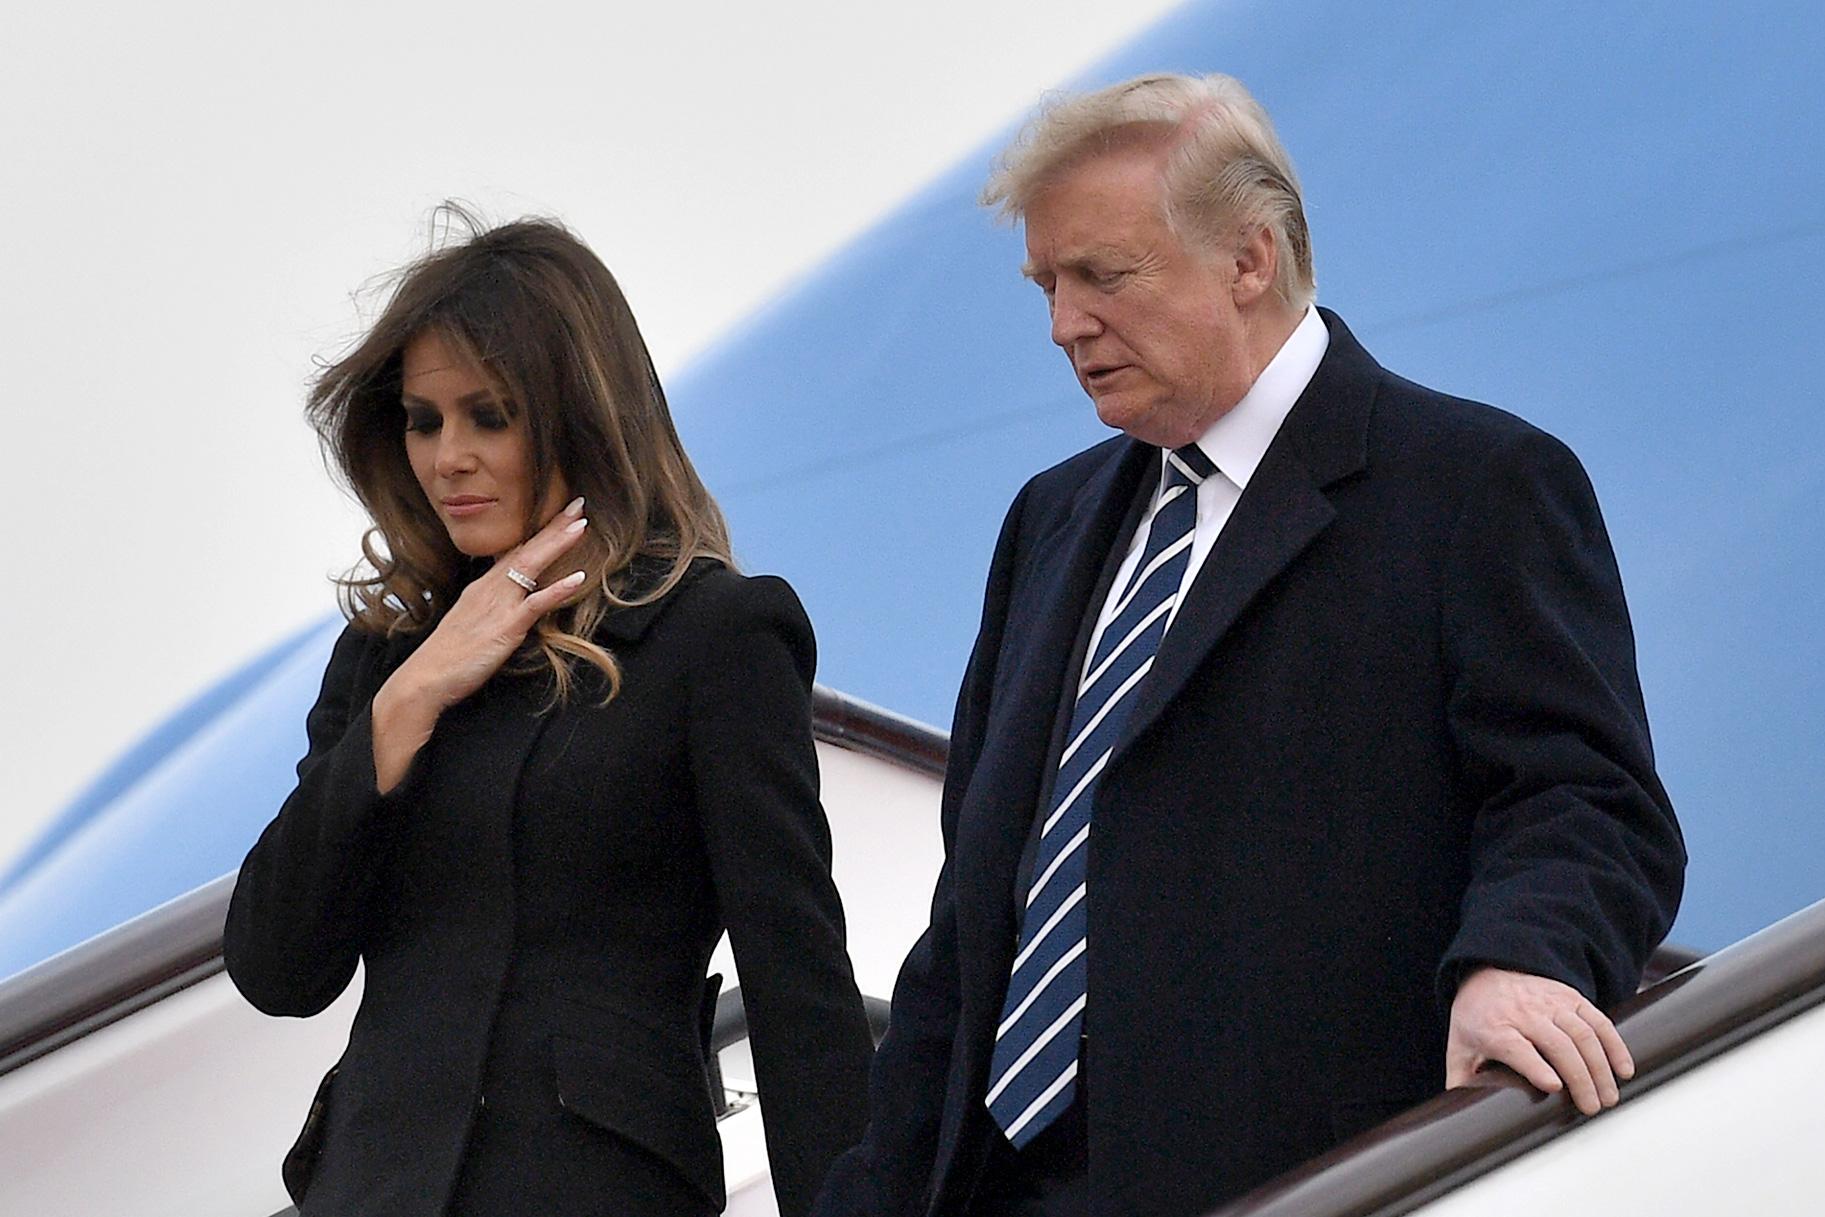 Trump And Melania Wedding.Donald Trump Melania No Wedding Anniversary Social Media